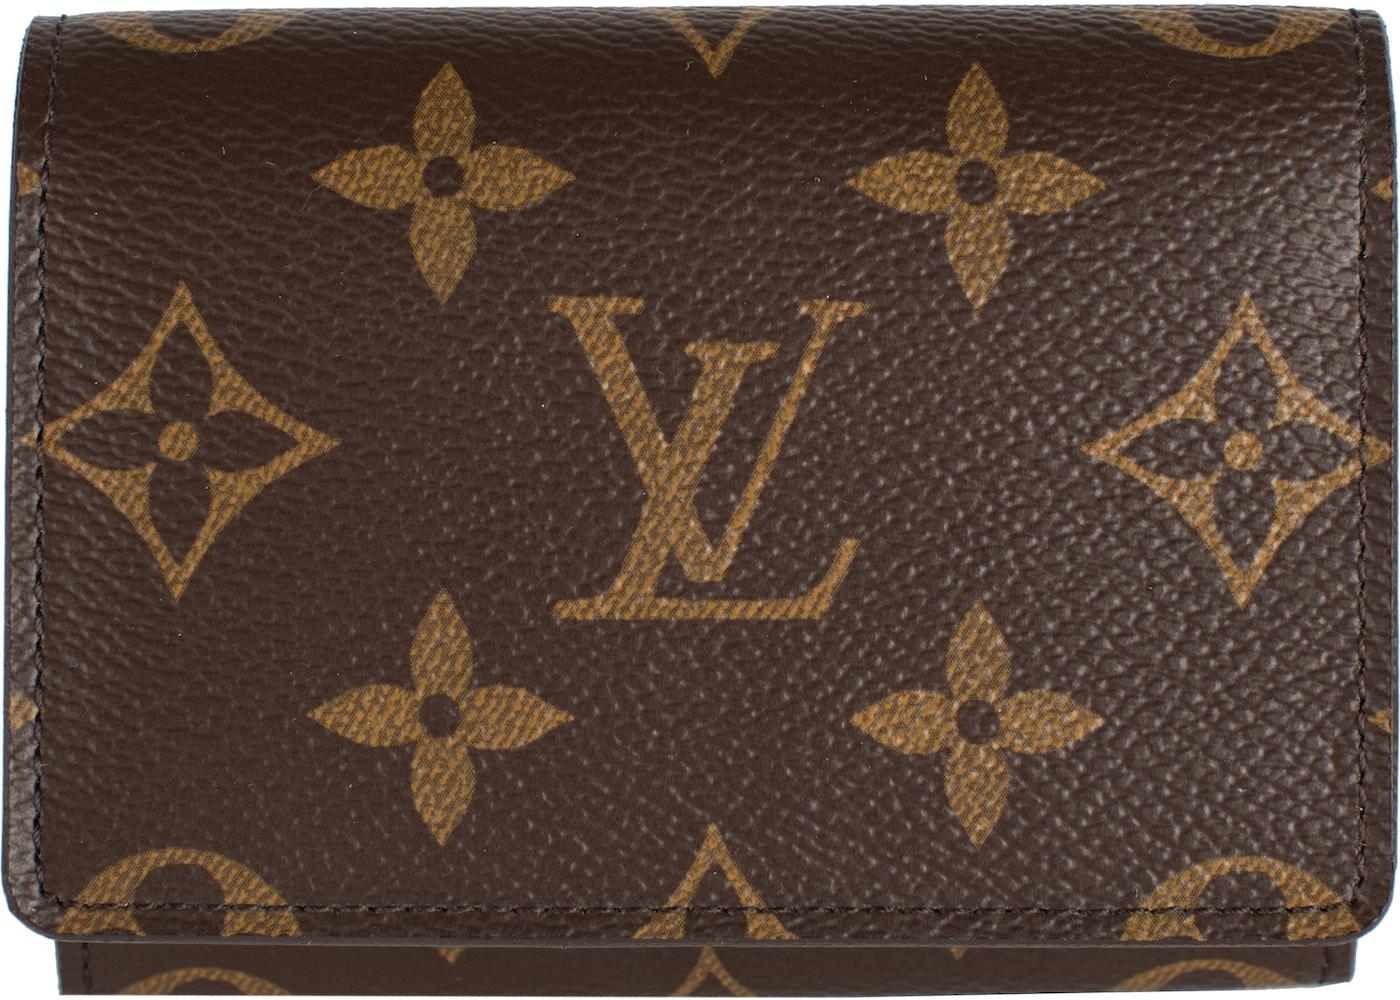 Vuitton business card holder monogram louis vuitton business card holder monogram colourmoves Images